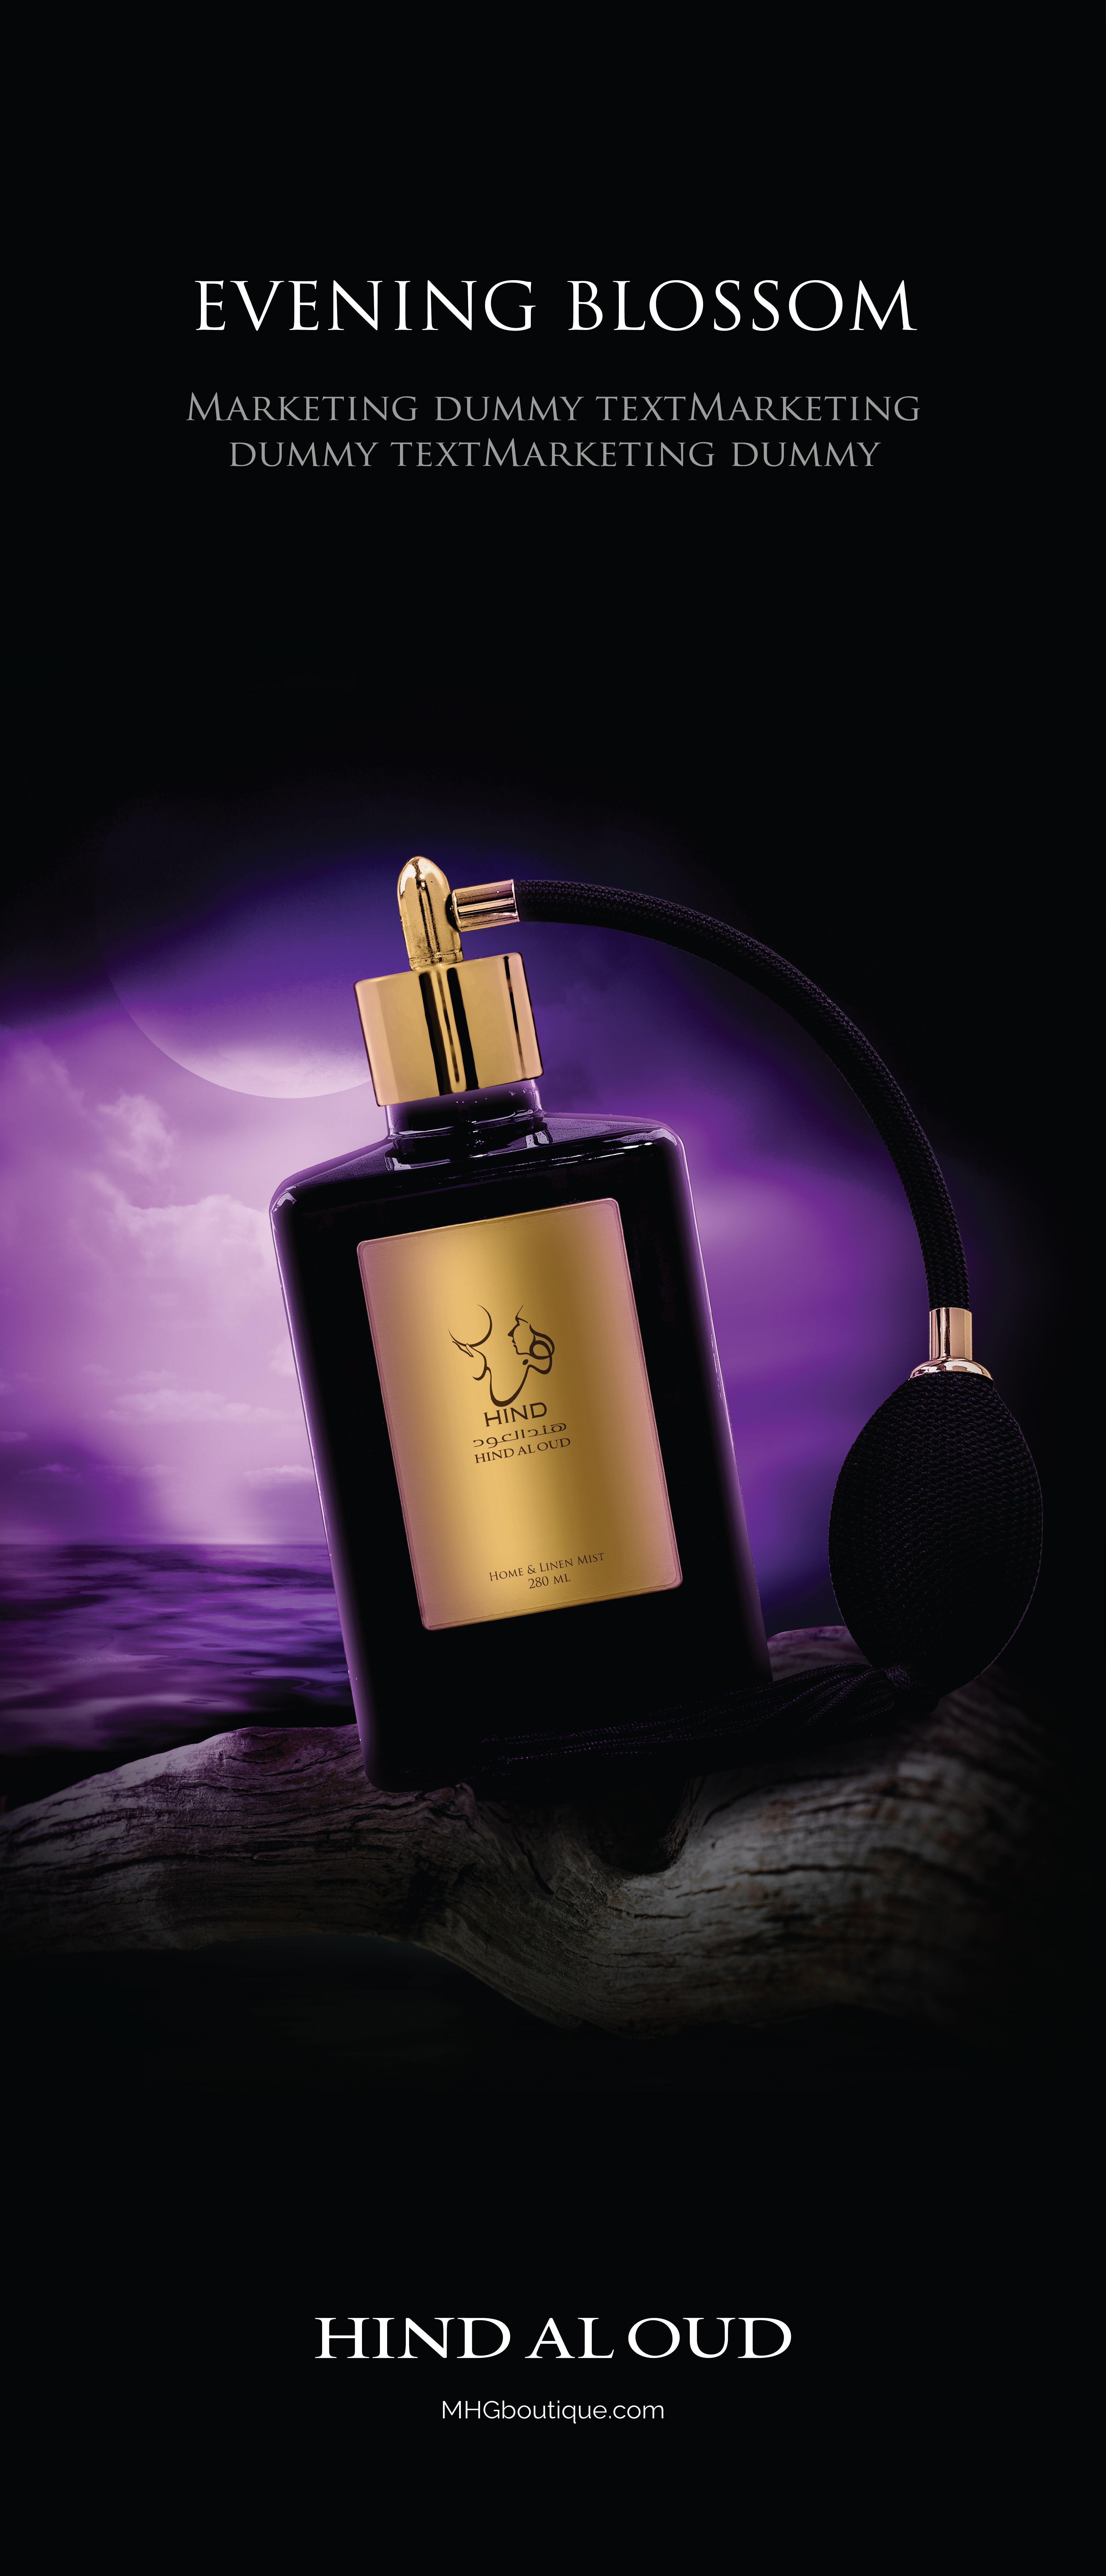 7b1ef50bb #Hind #AlOud #HindAlOud #Oud #هندـالعود #هند #عود #دهن #Oud #Dehn #Emarati  #UAE #Dubai #Luxury #Perfumes #عطور #هلال #دهنـعود #إماراتي #دبي